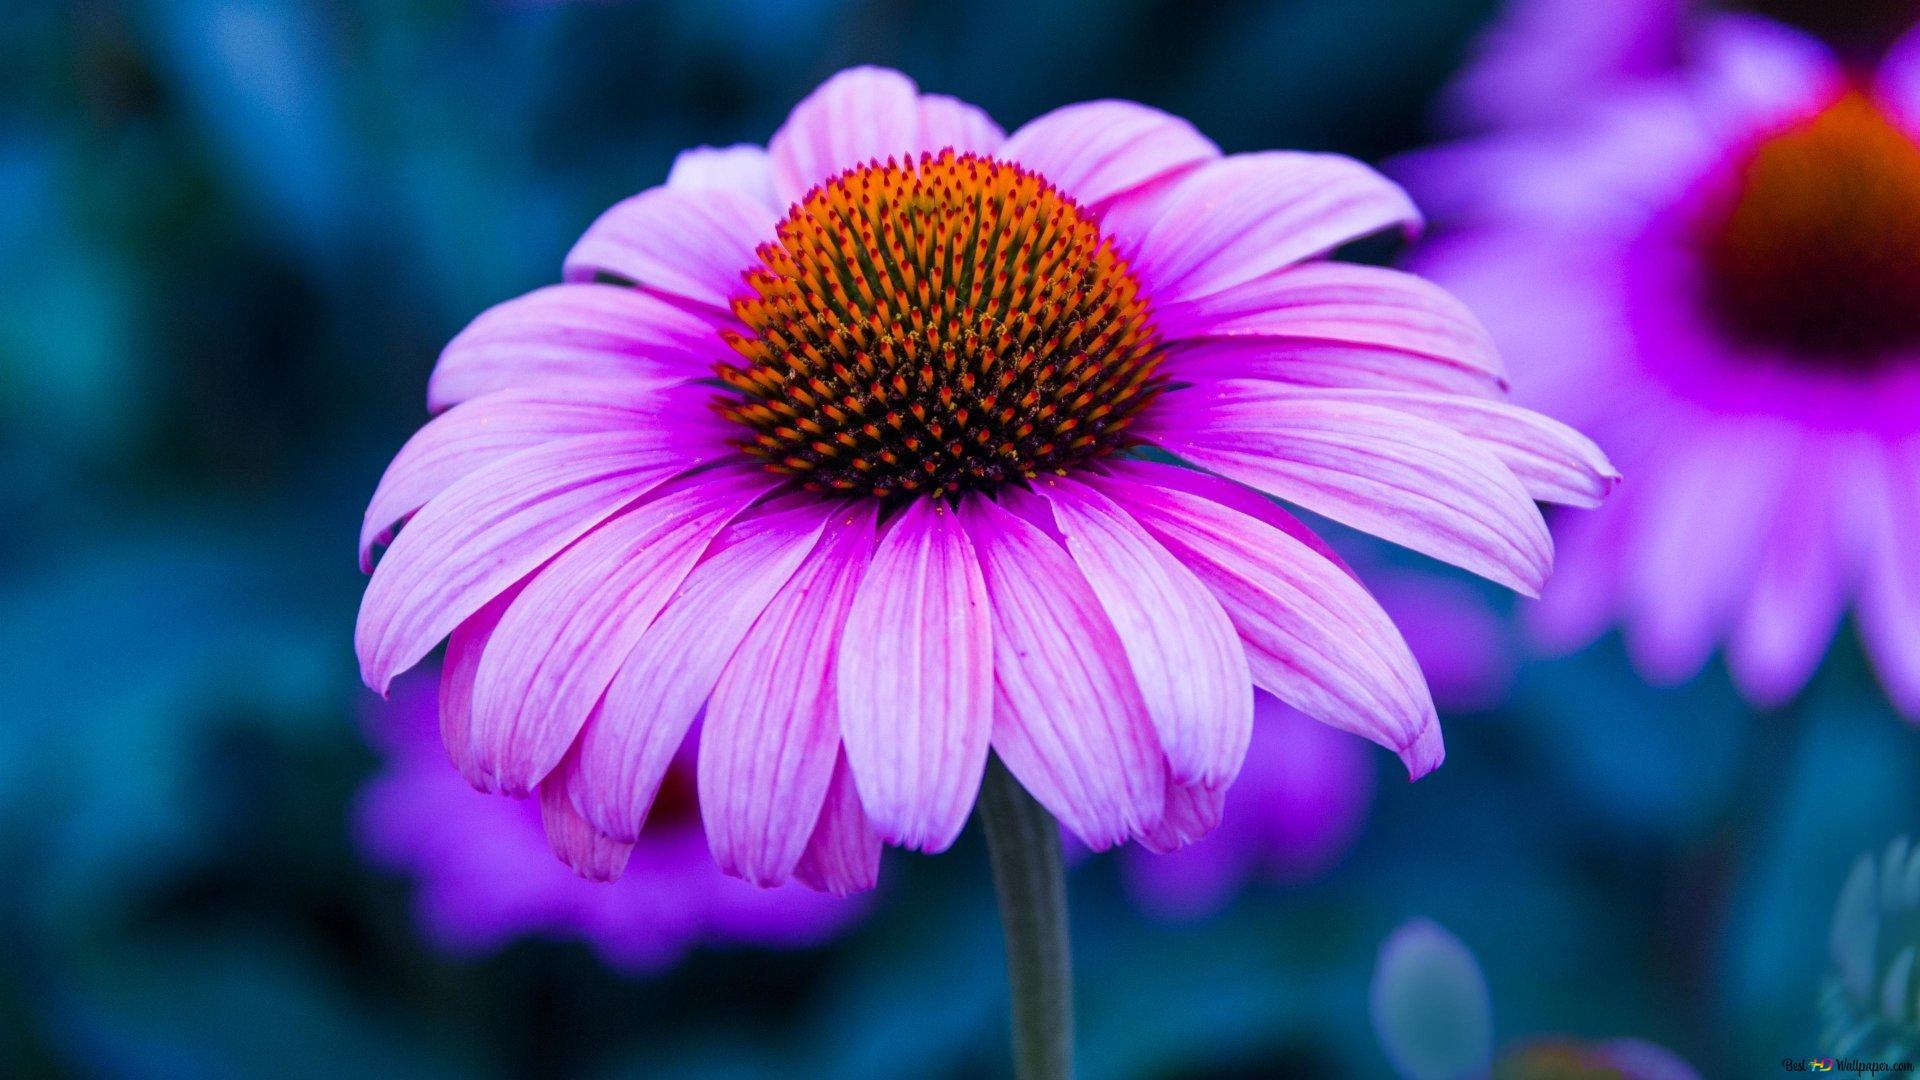 Purple Coneflower Wallpapers: Purple Echinacea Flower HD Wallpaper Download